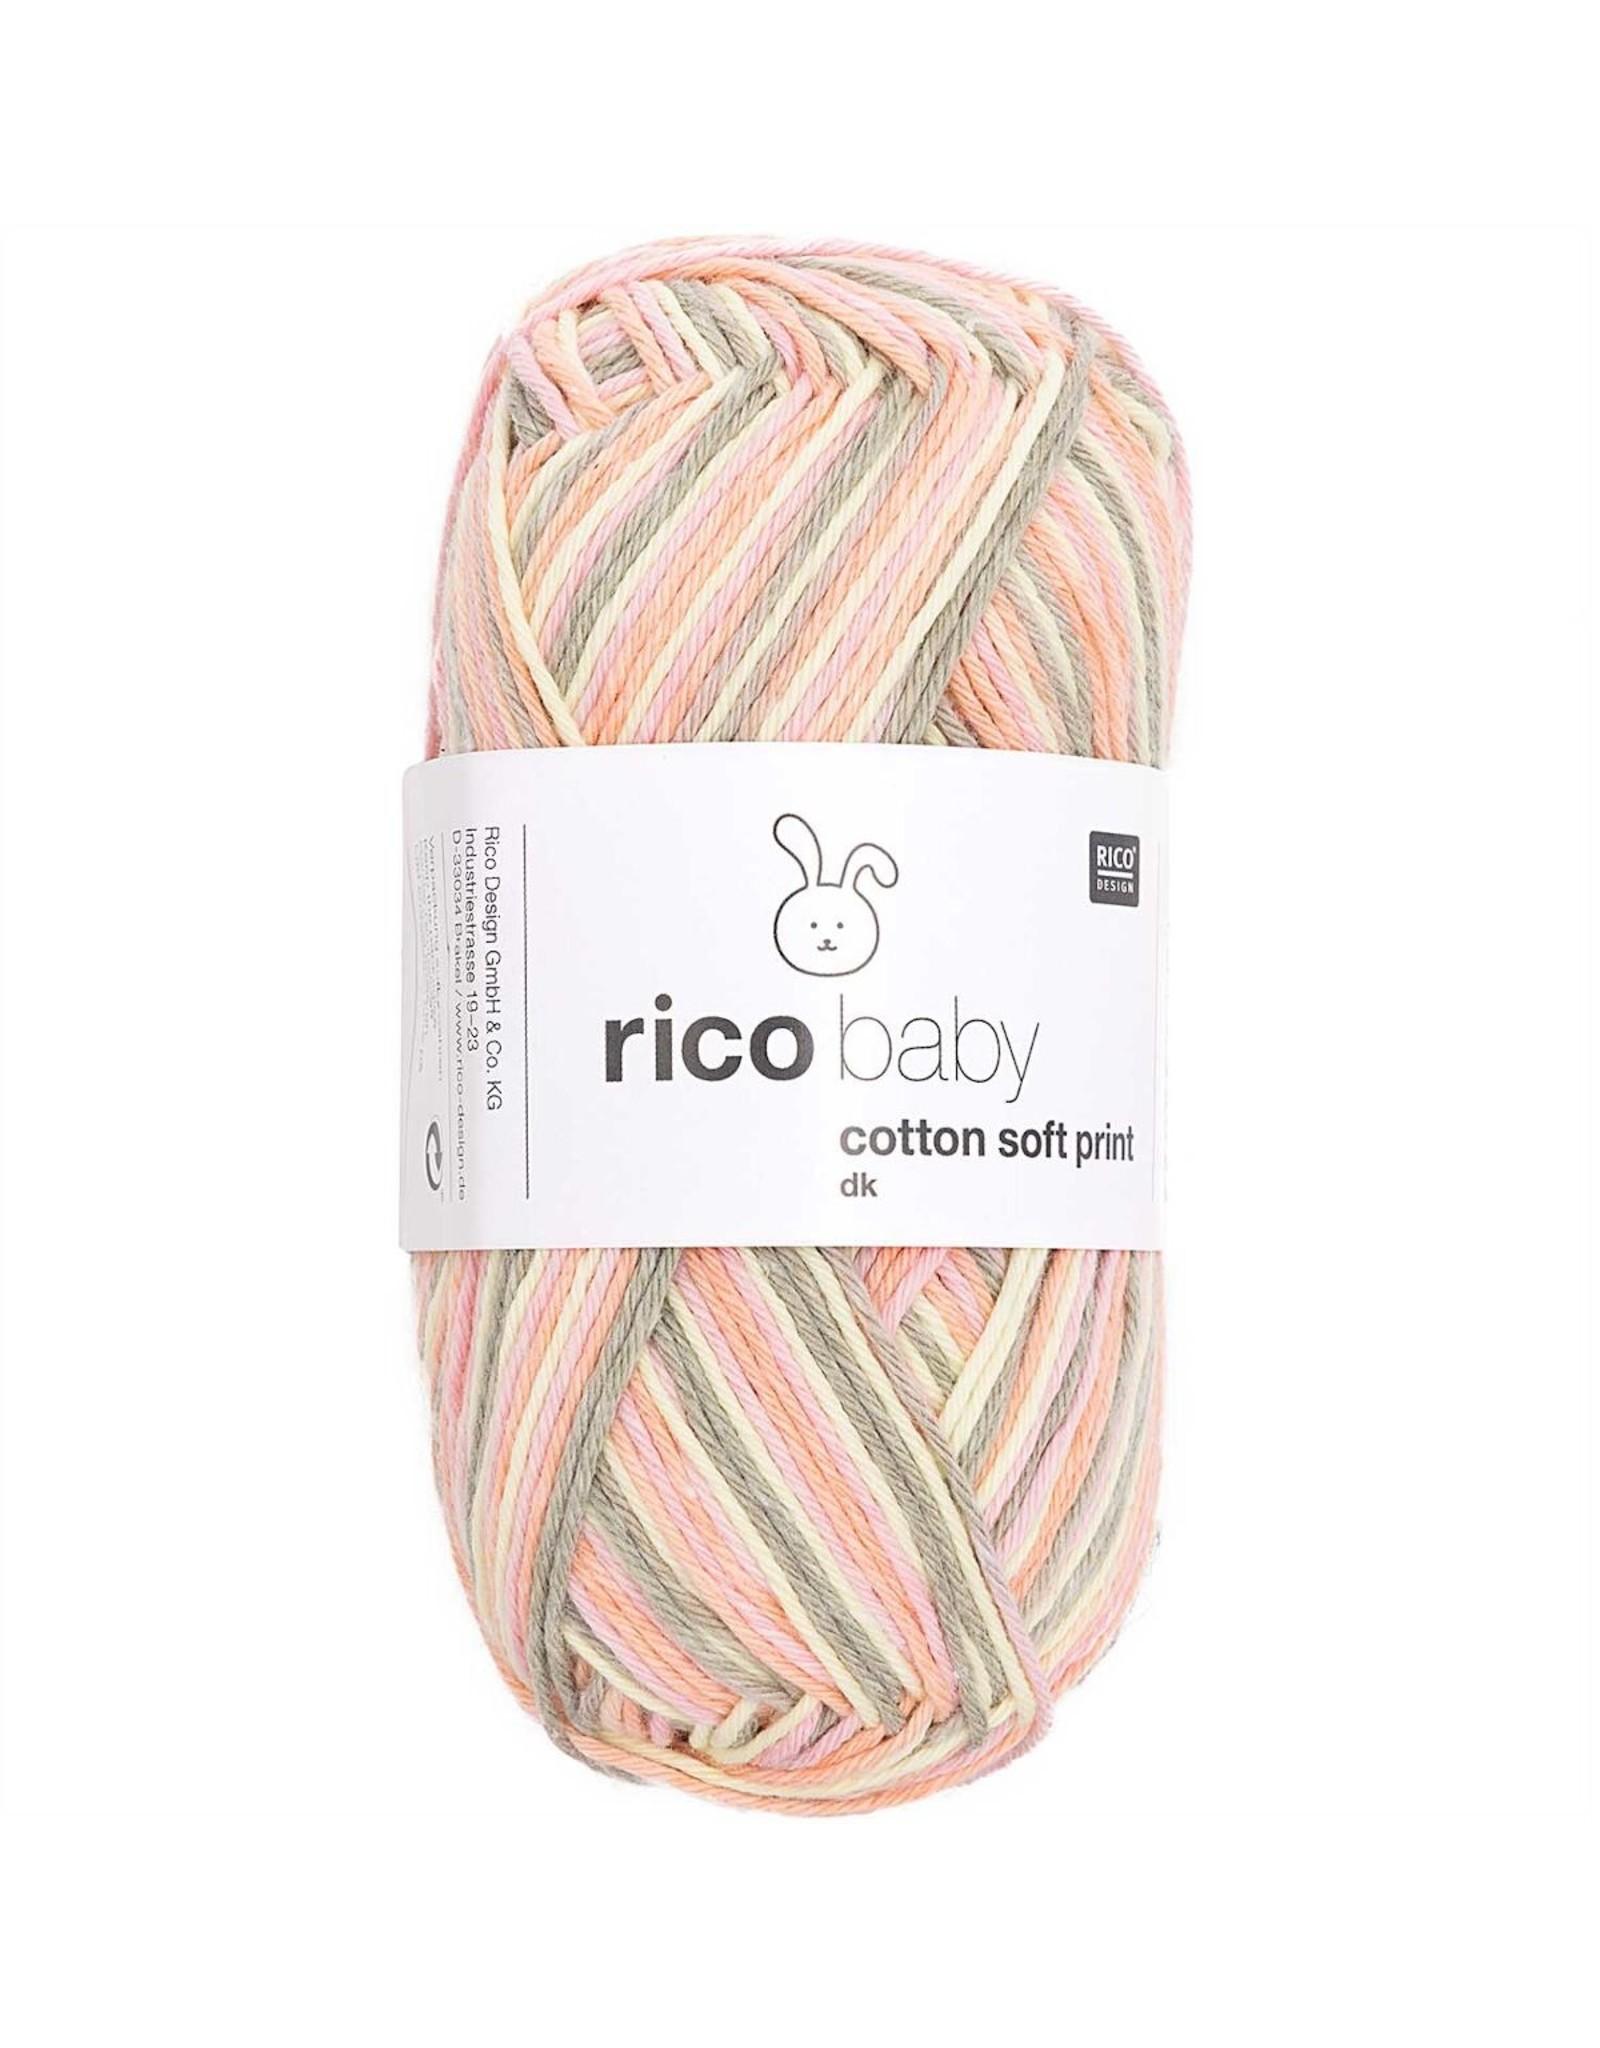 Rico Rico Baby Cotton Soft Print dk *